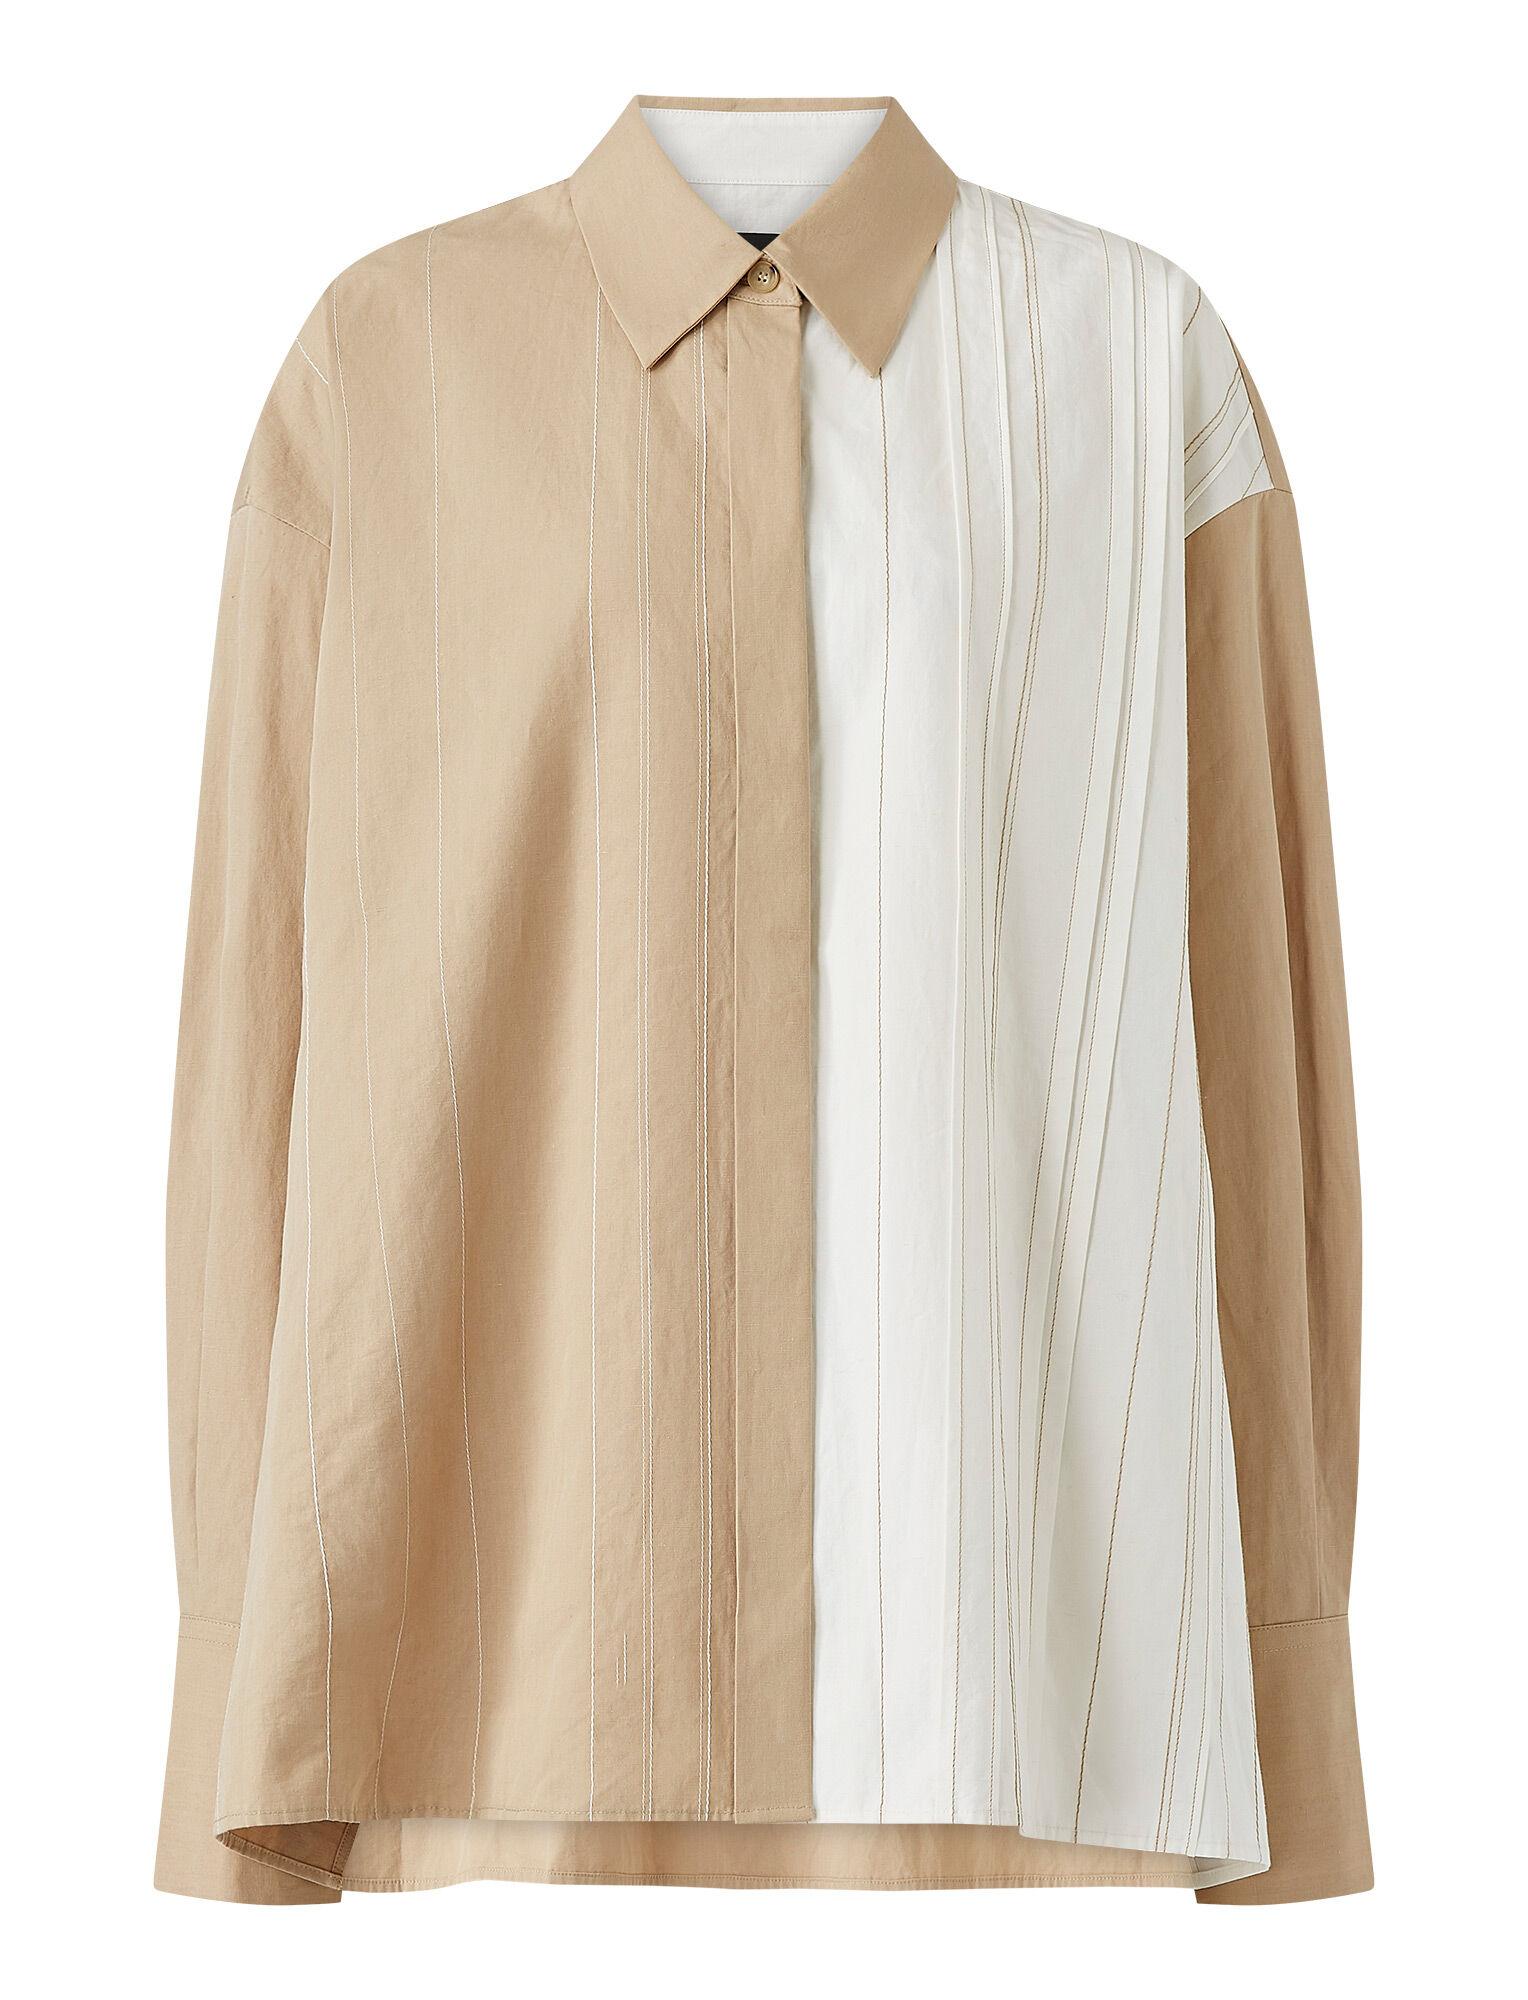 Joseph, Cotton Linen Bacar Blouse, in LINEN/OFF WHITE